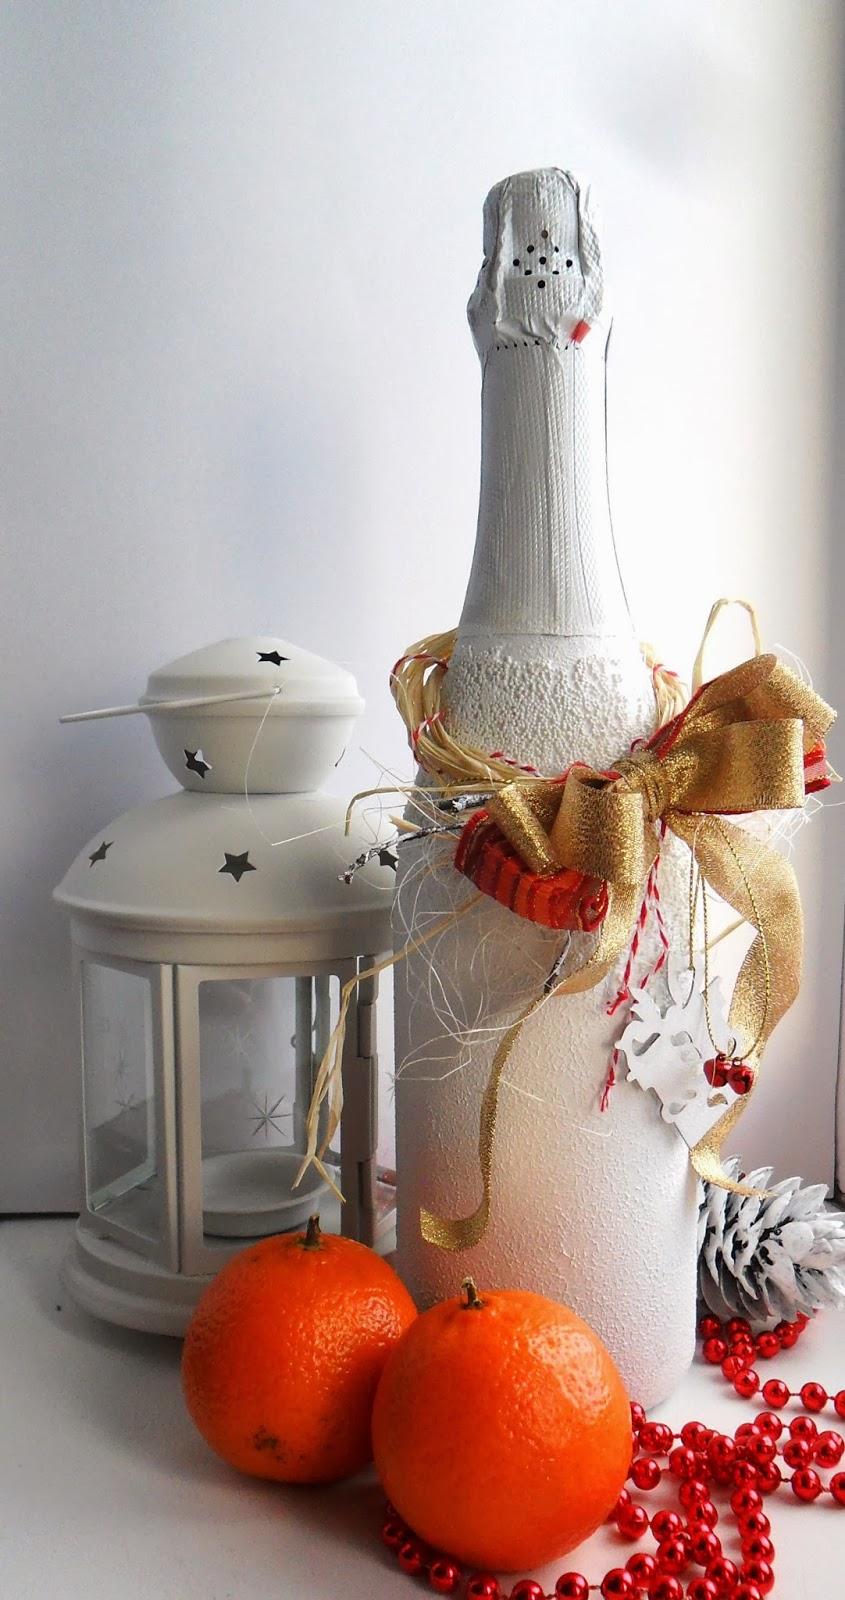 Новогодний декор бутылки шампанского бисером